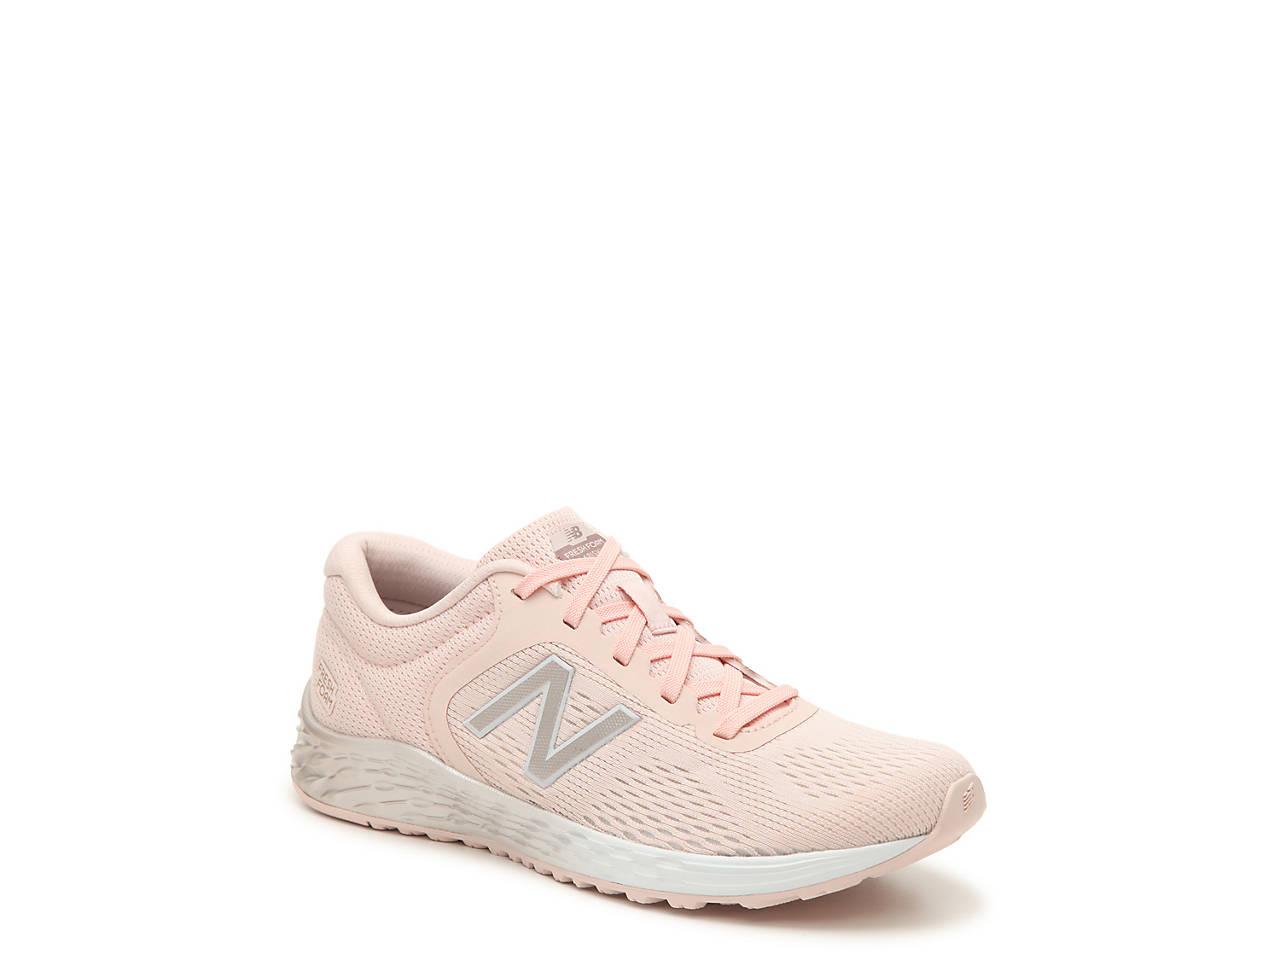 43444728a New Balance Fresh Foam Arishi Toddler & Youth Running Shoe Kids ...